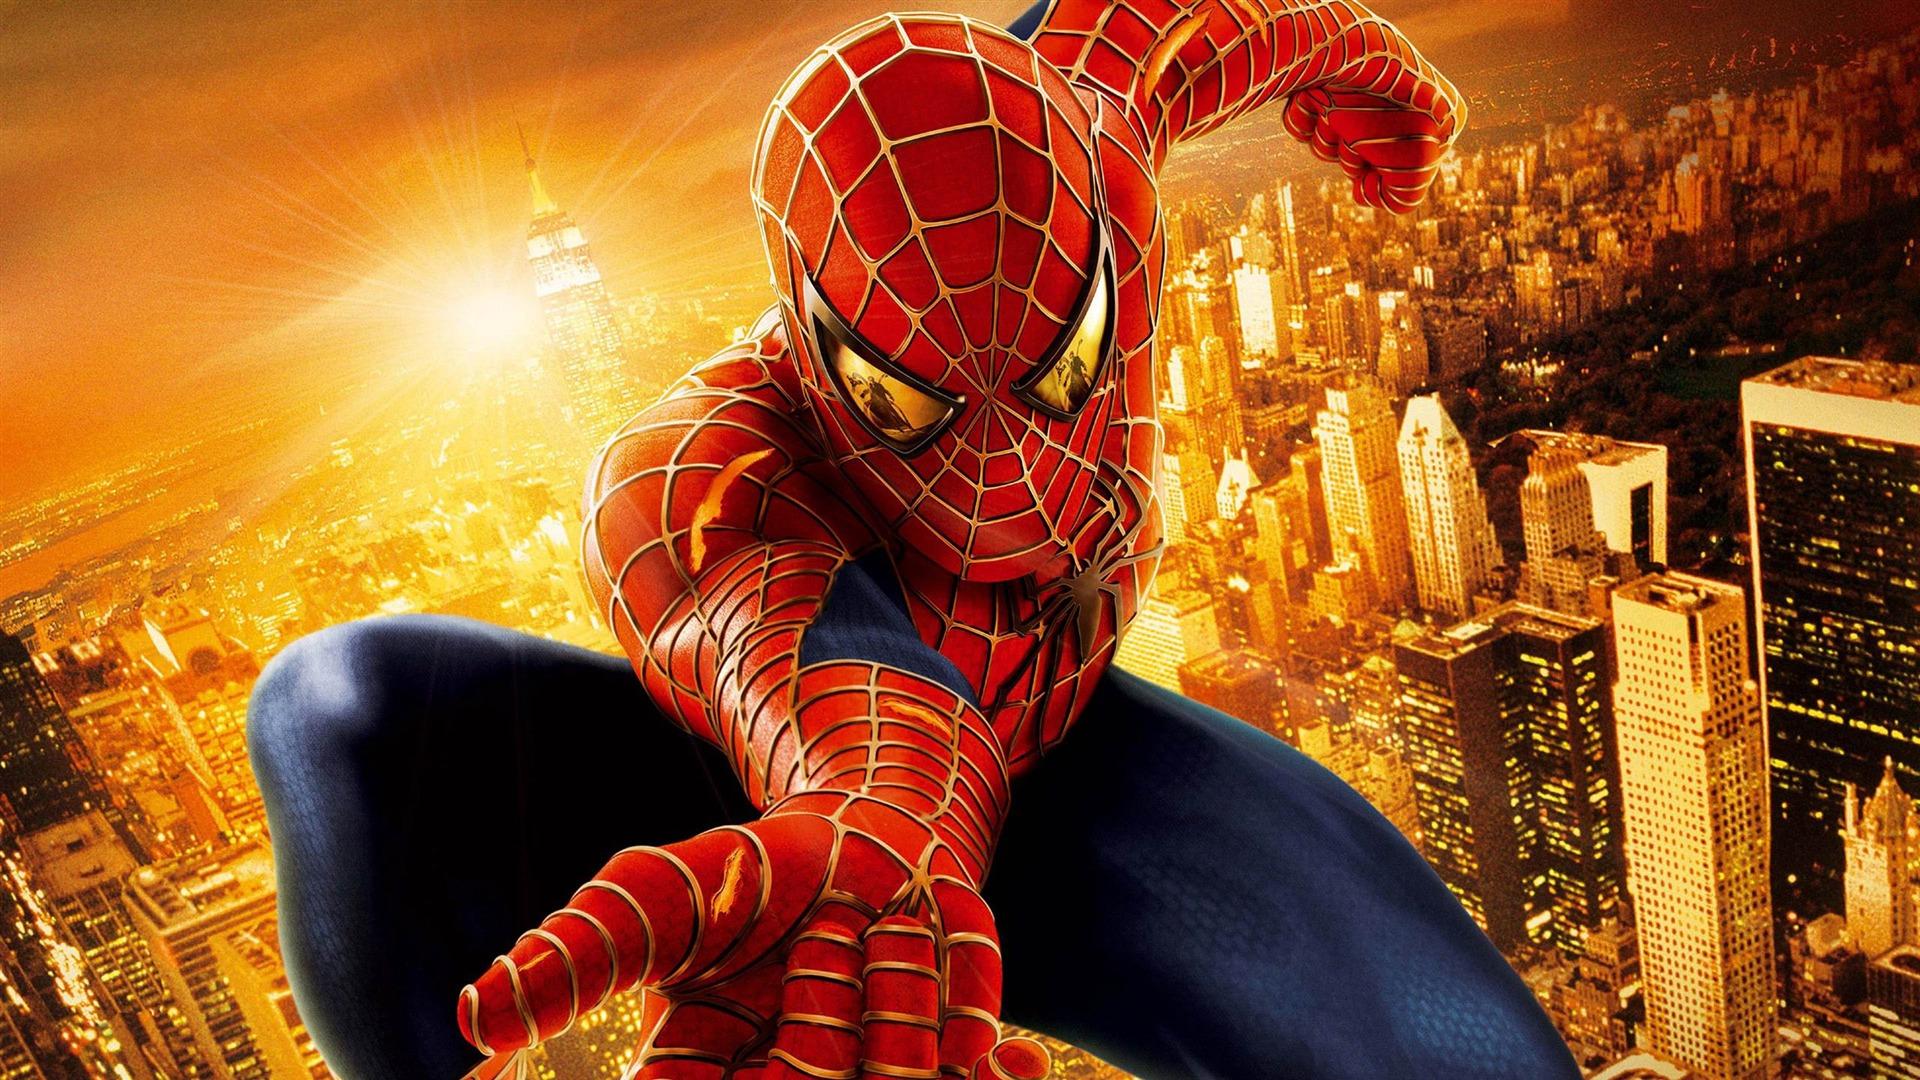 The Amazing Spider Man 2012 Hd Movie Wallpaper Avance